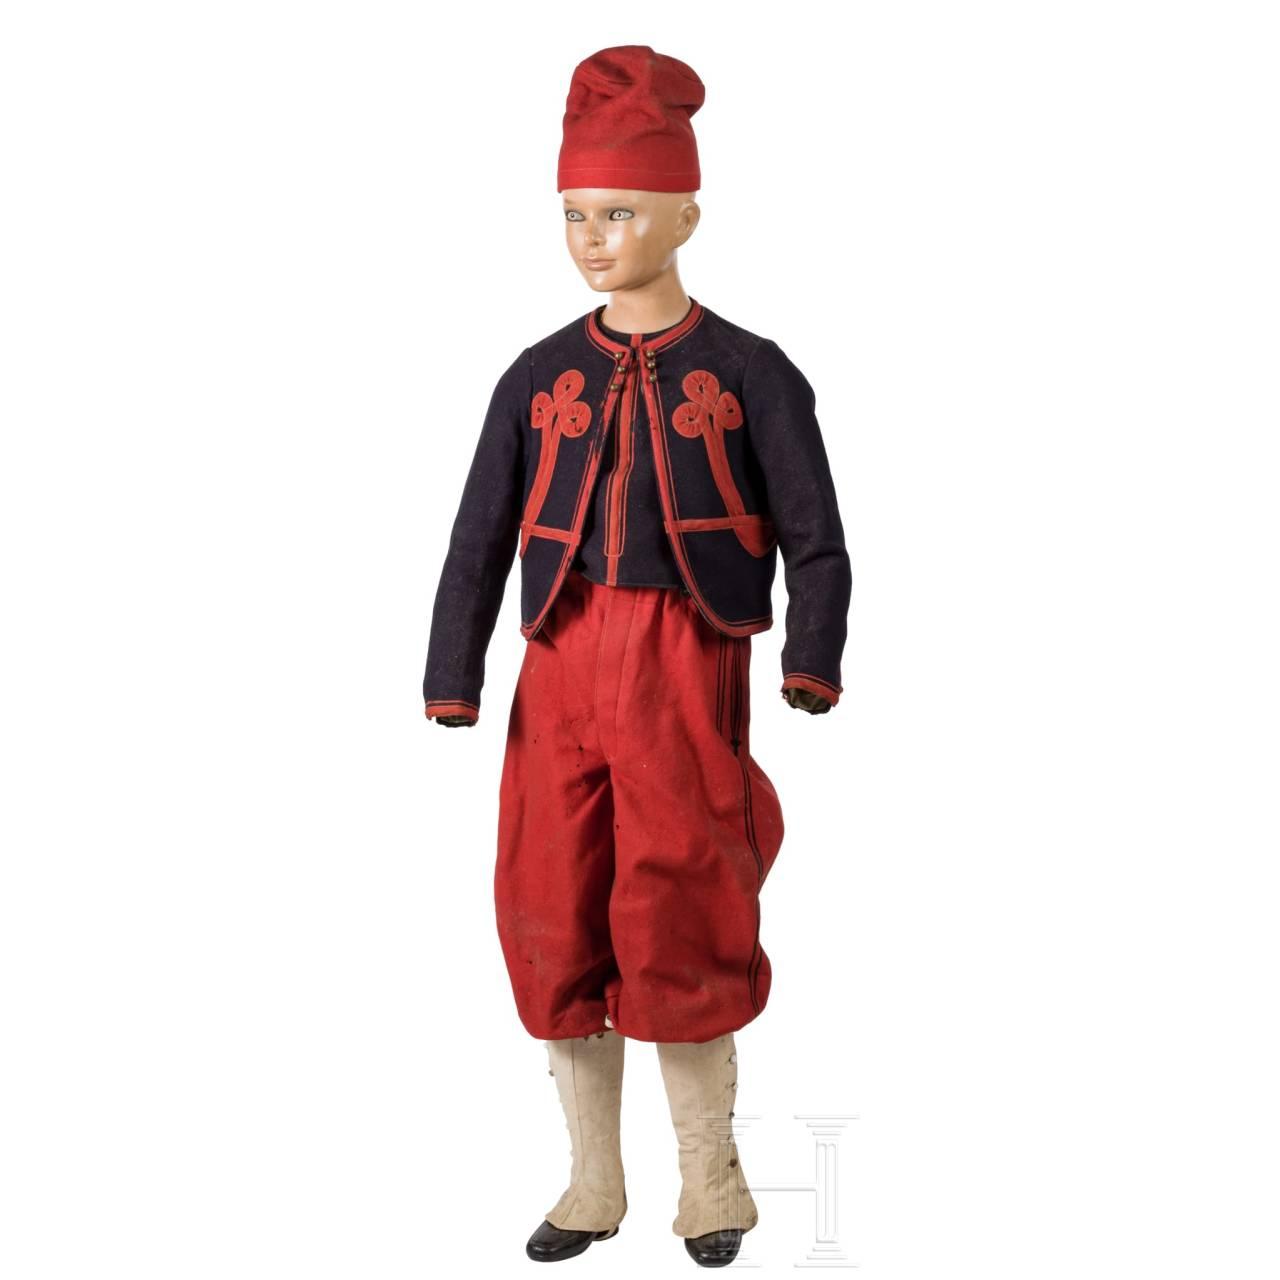 Zuaven-Kinderuniform, USA, 19. Jhdt.